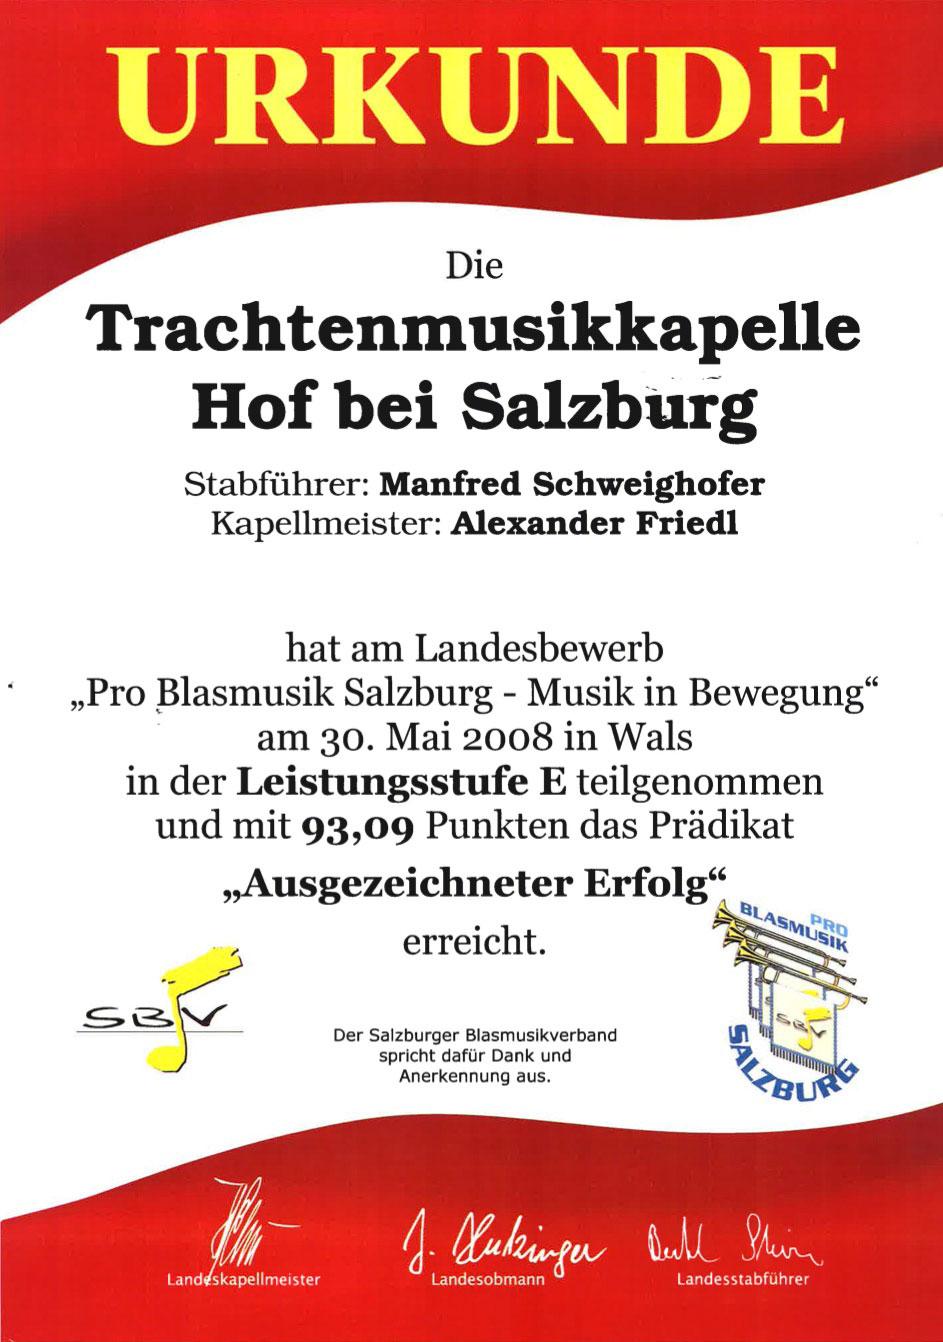 2008-Landesbewerb-Wals